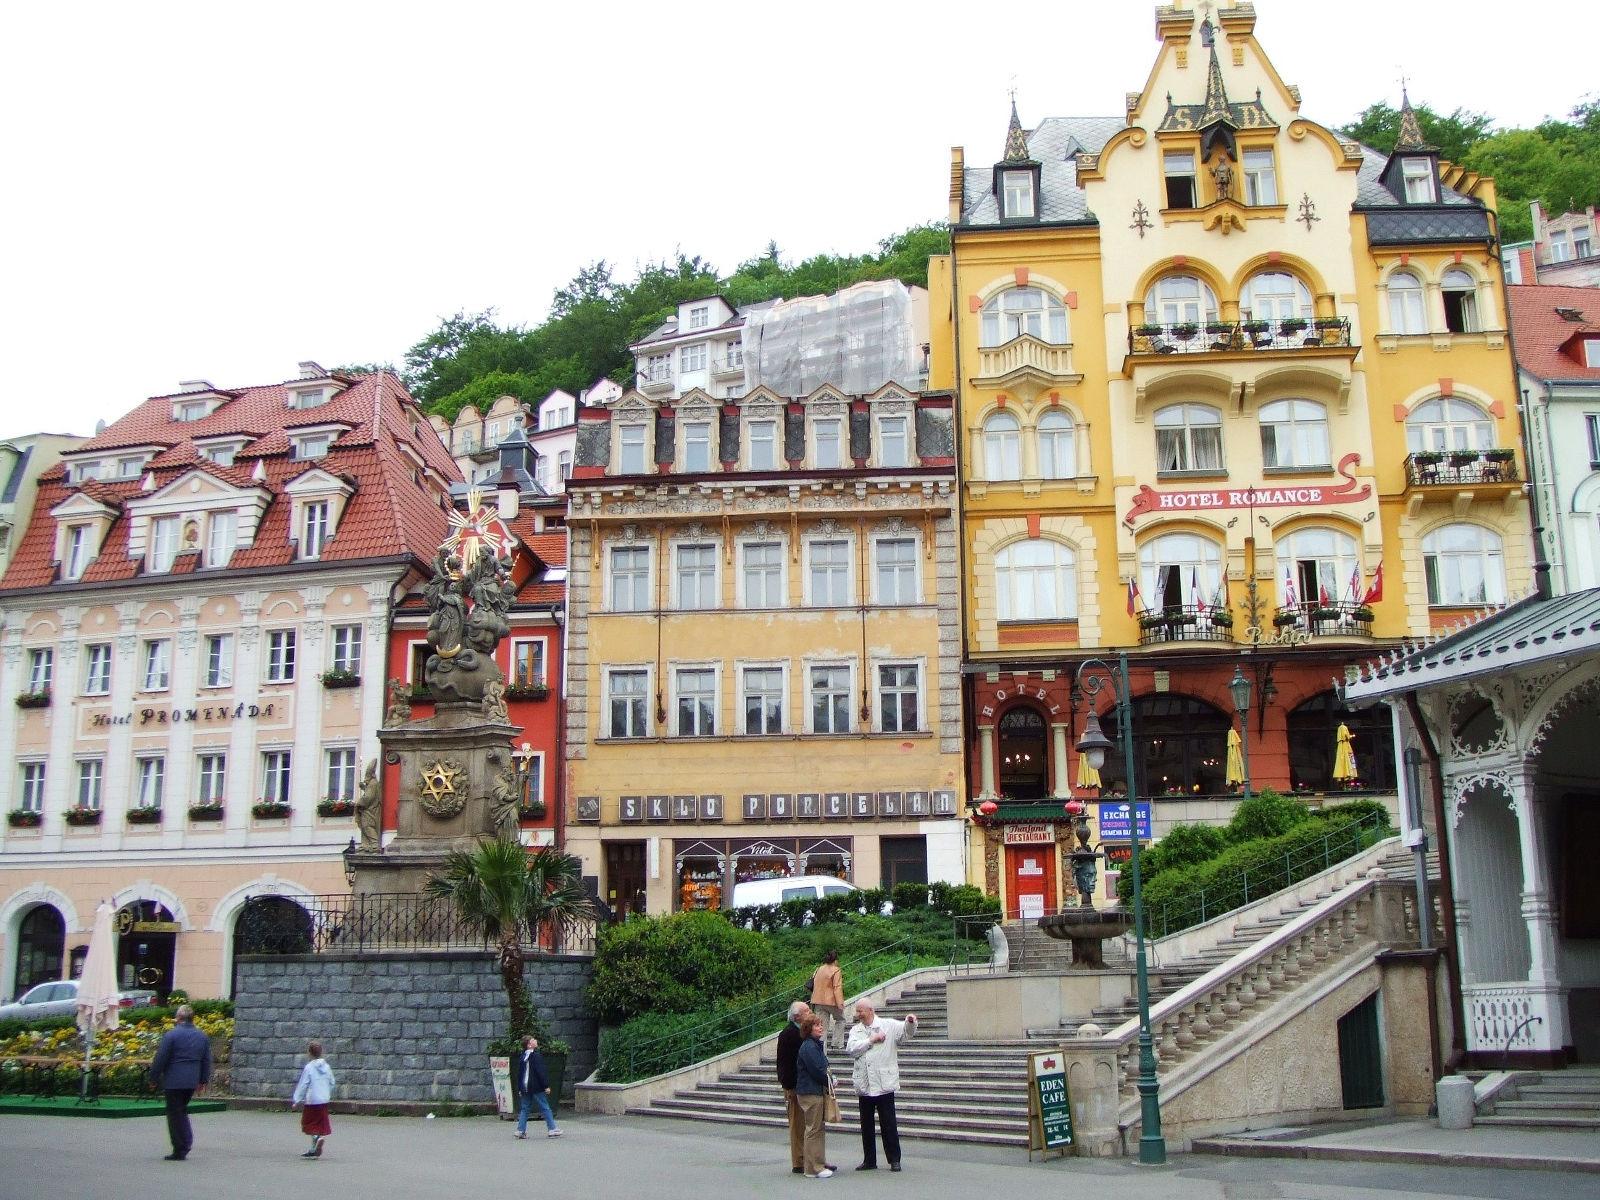 Sc Baden-Baden